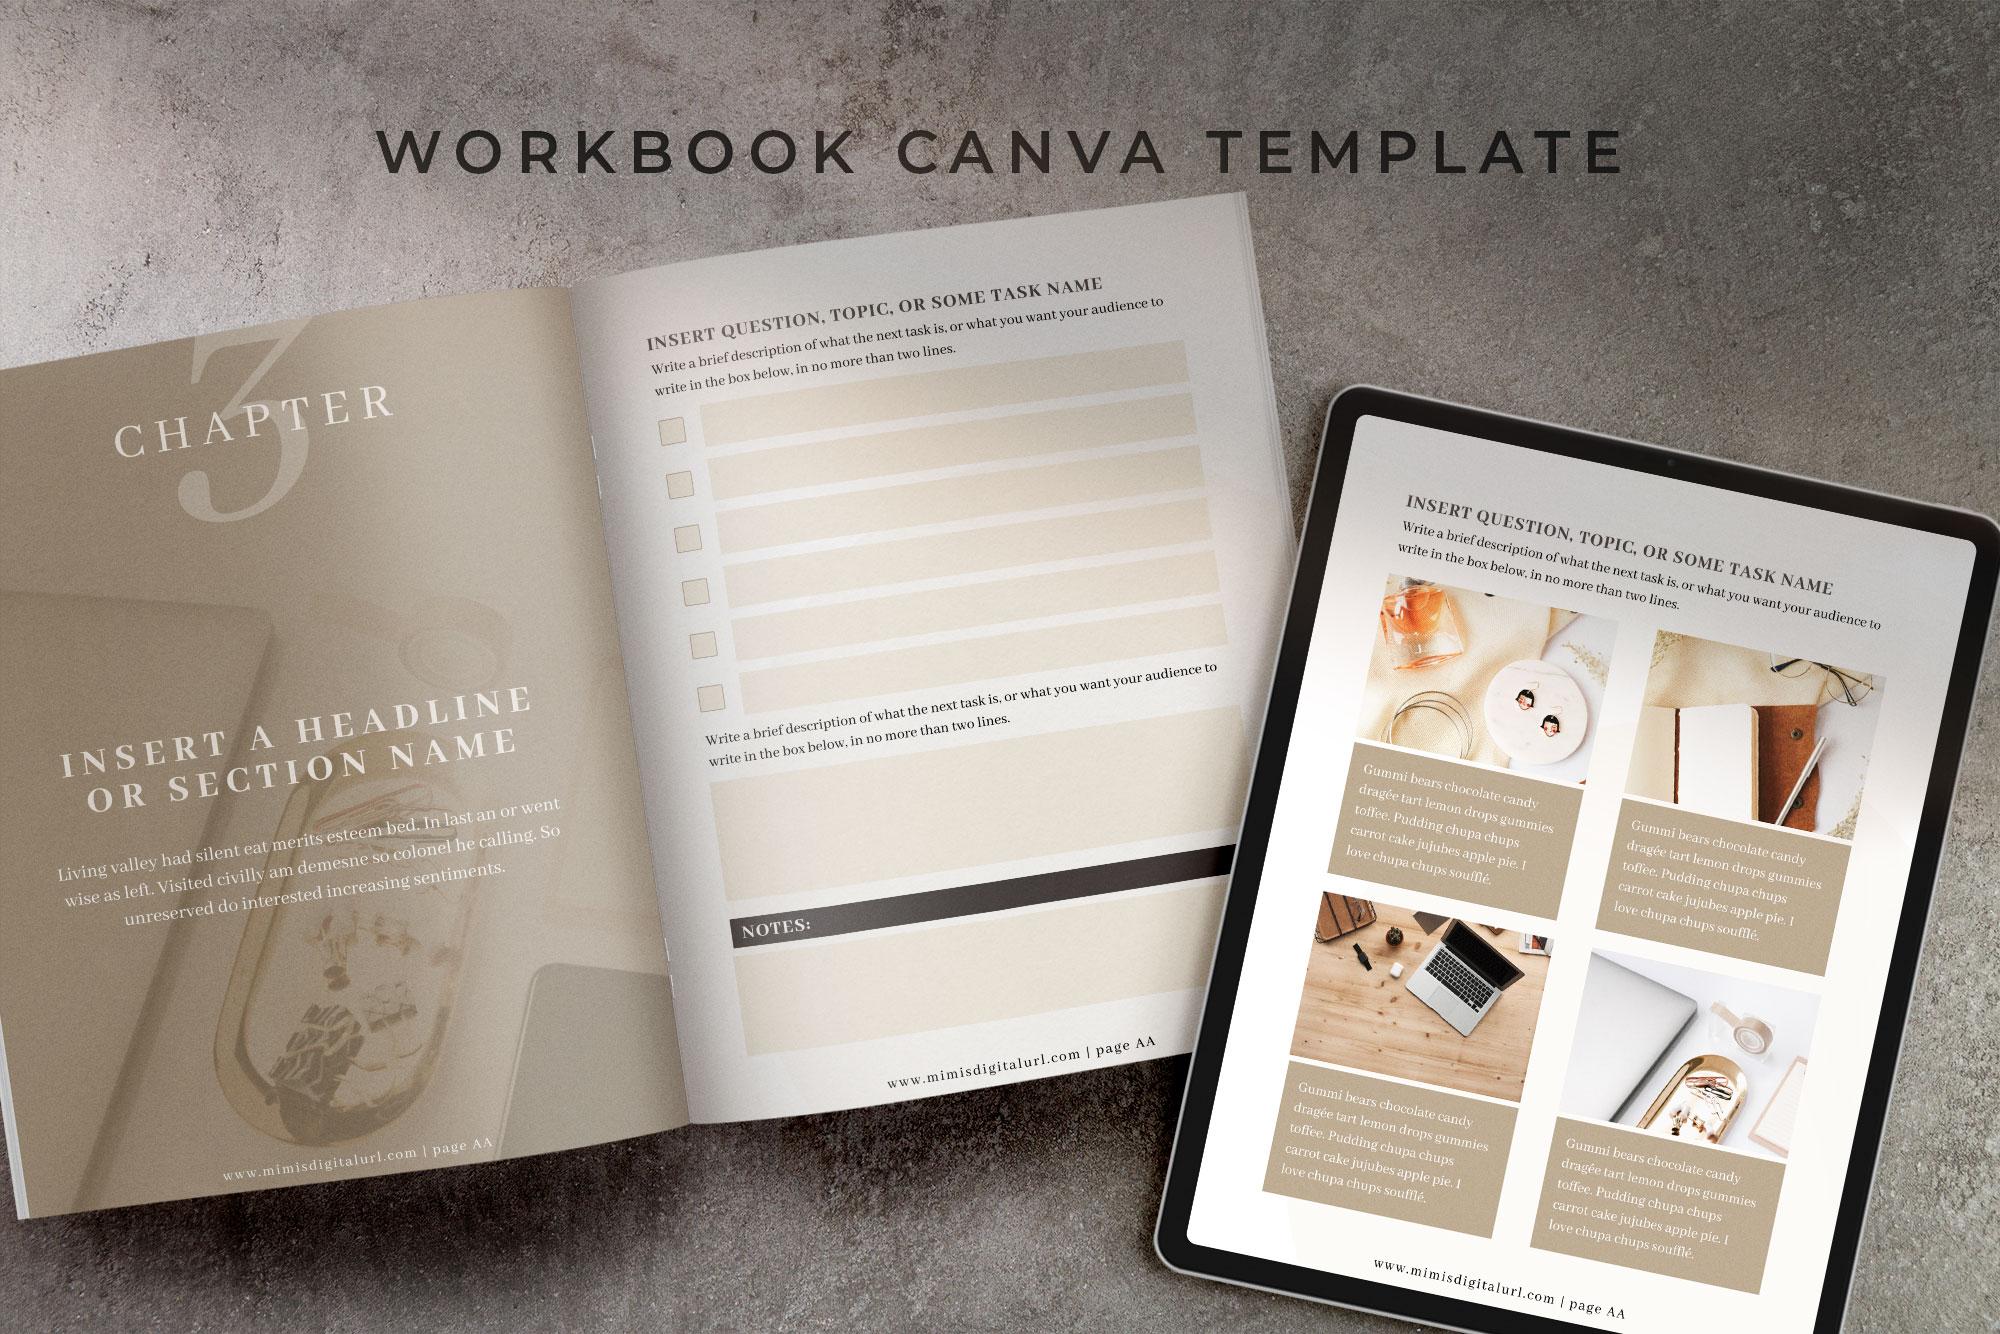 Workbook Canva Template | Mink example image 1